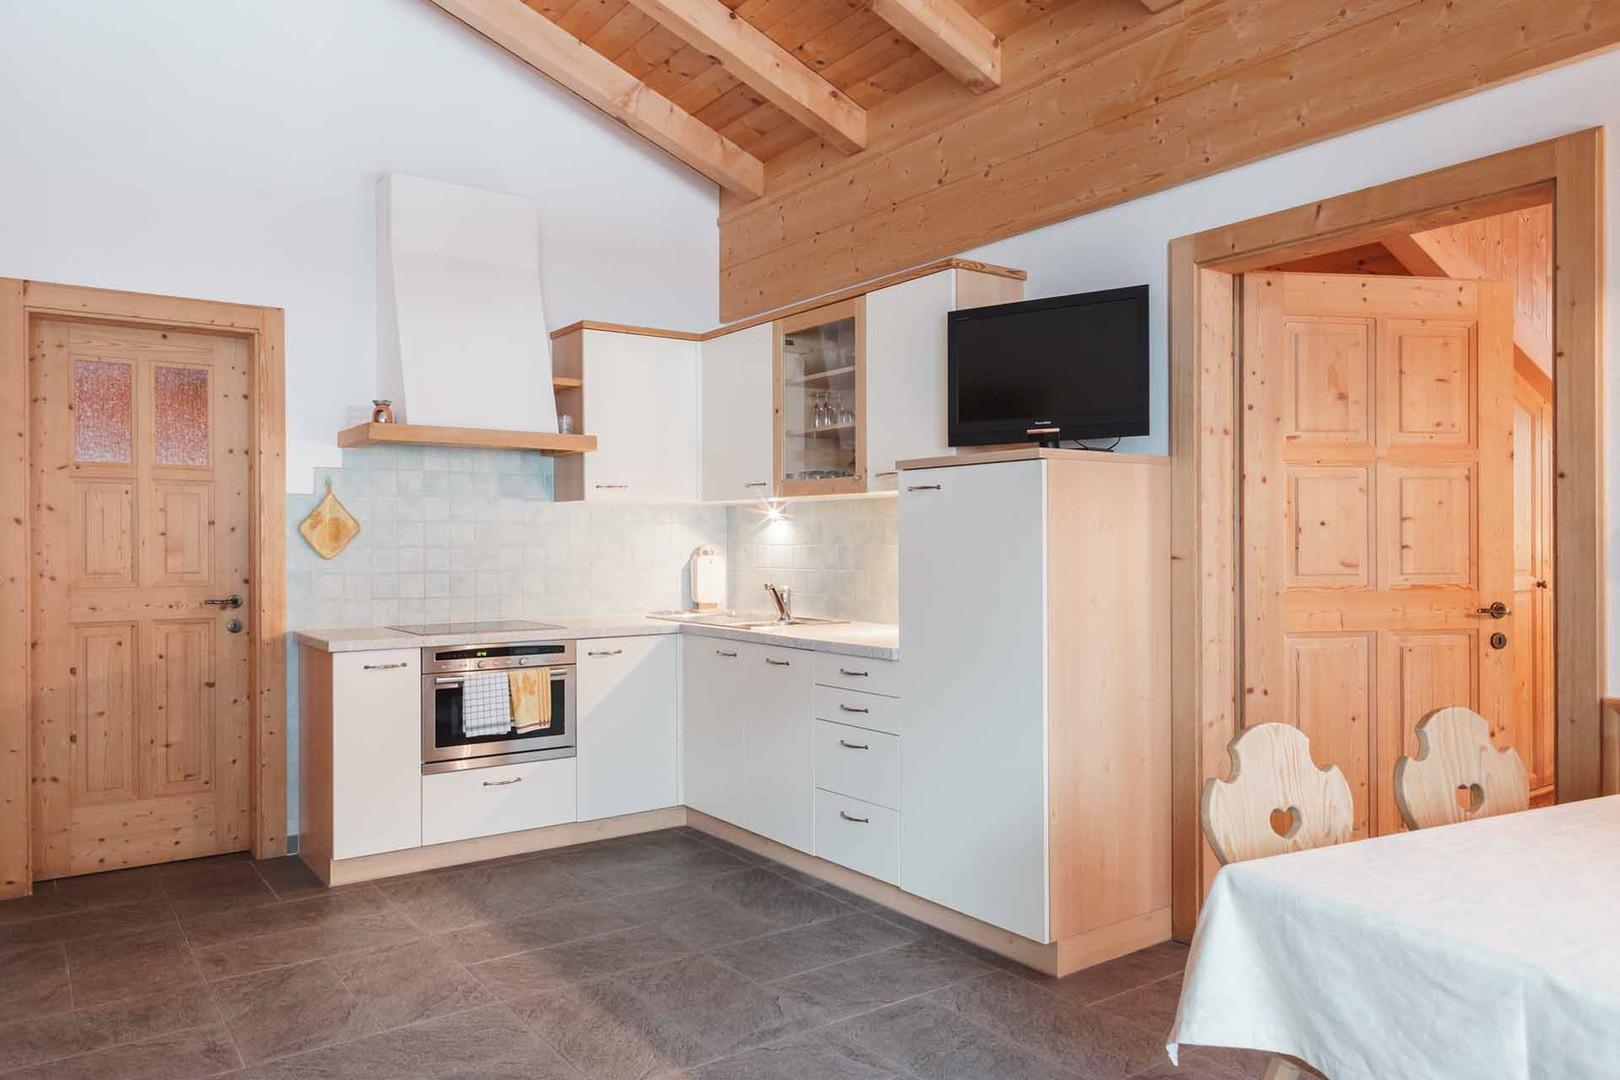 Residence_Karnutsch_Ultental_Margerite5.